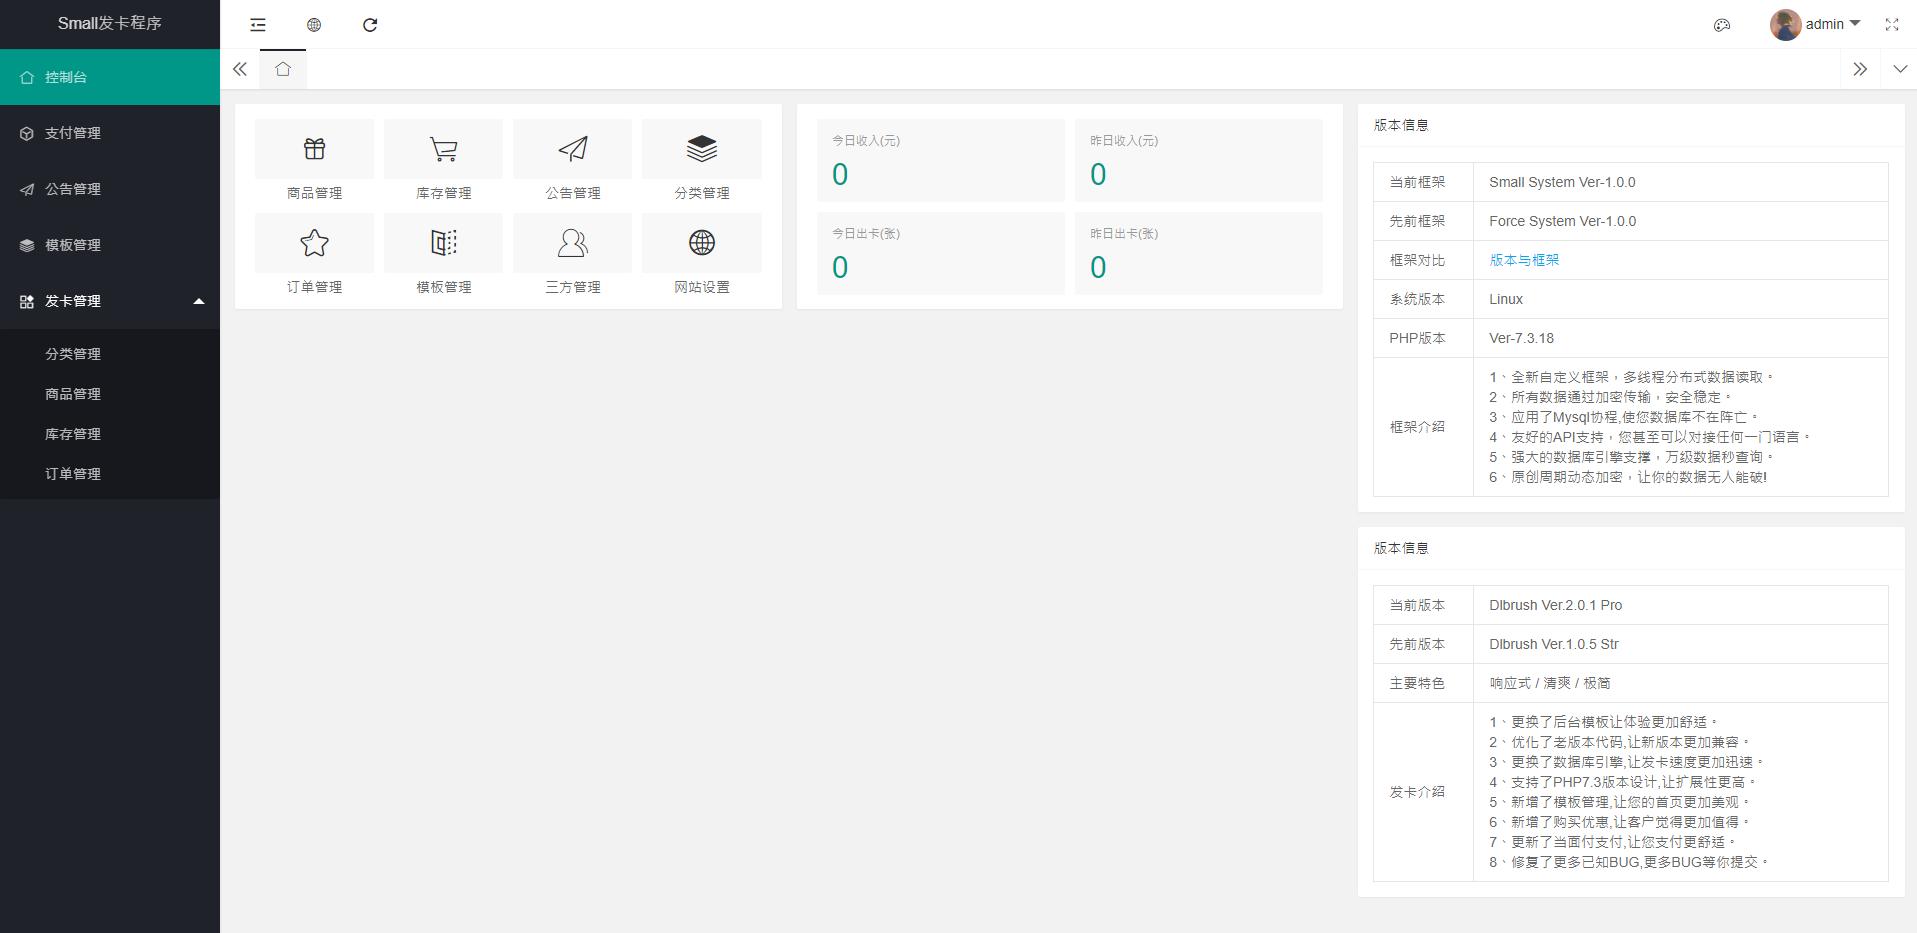 small发卡源码 V1.0.1 最新版small发卡网源码+支付系统+内置对接系统